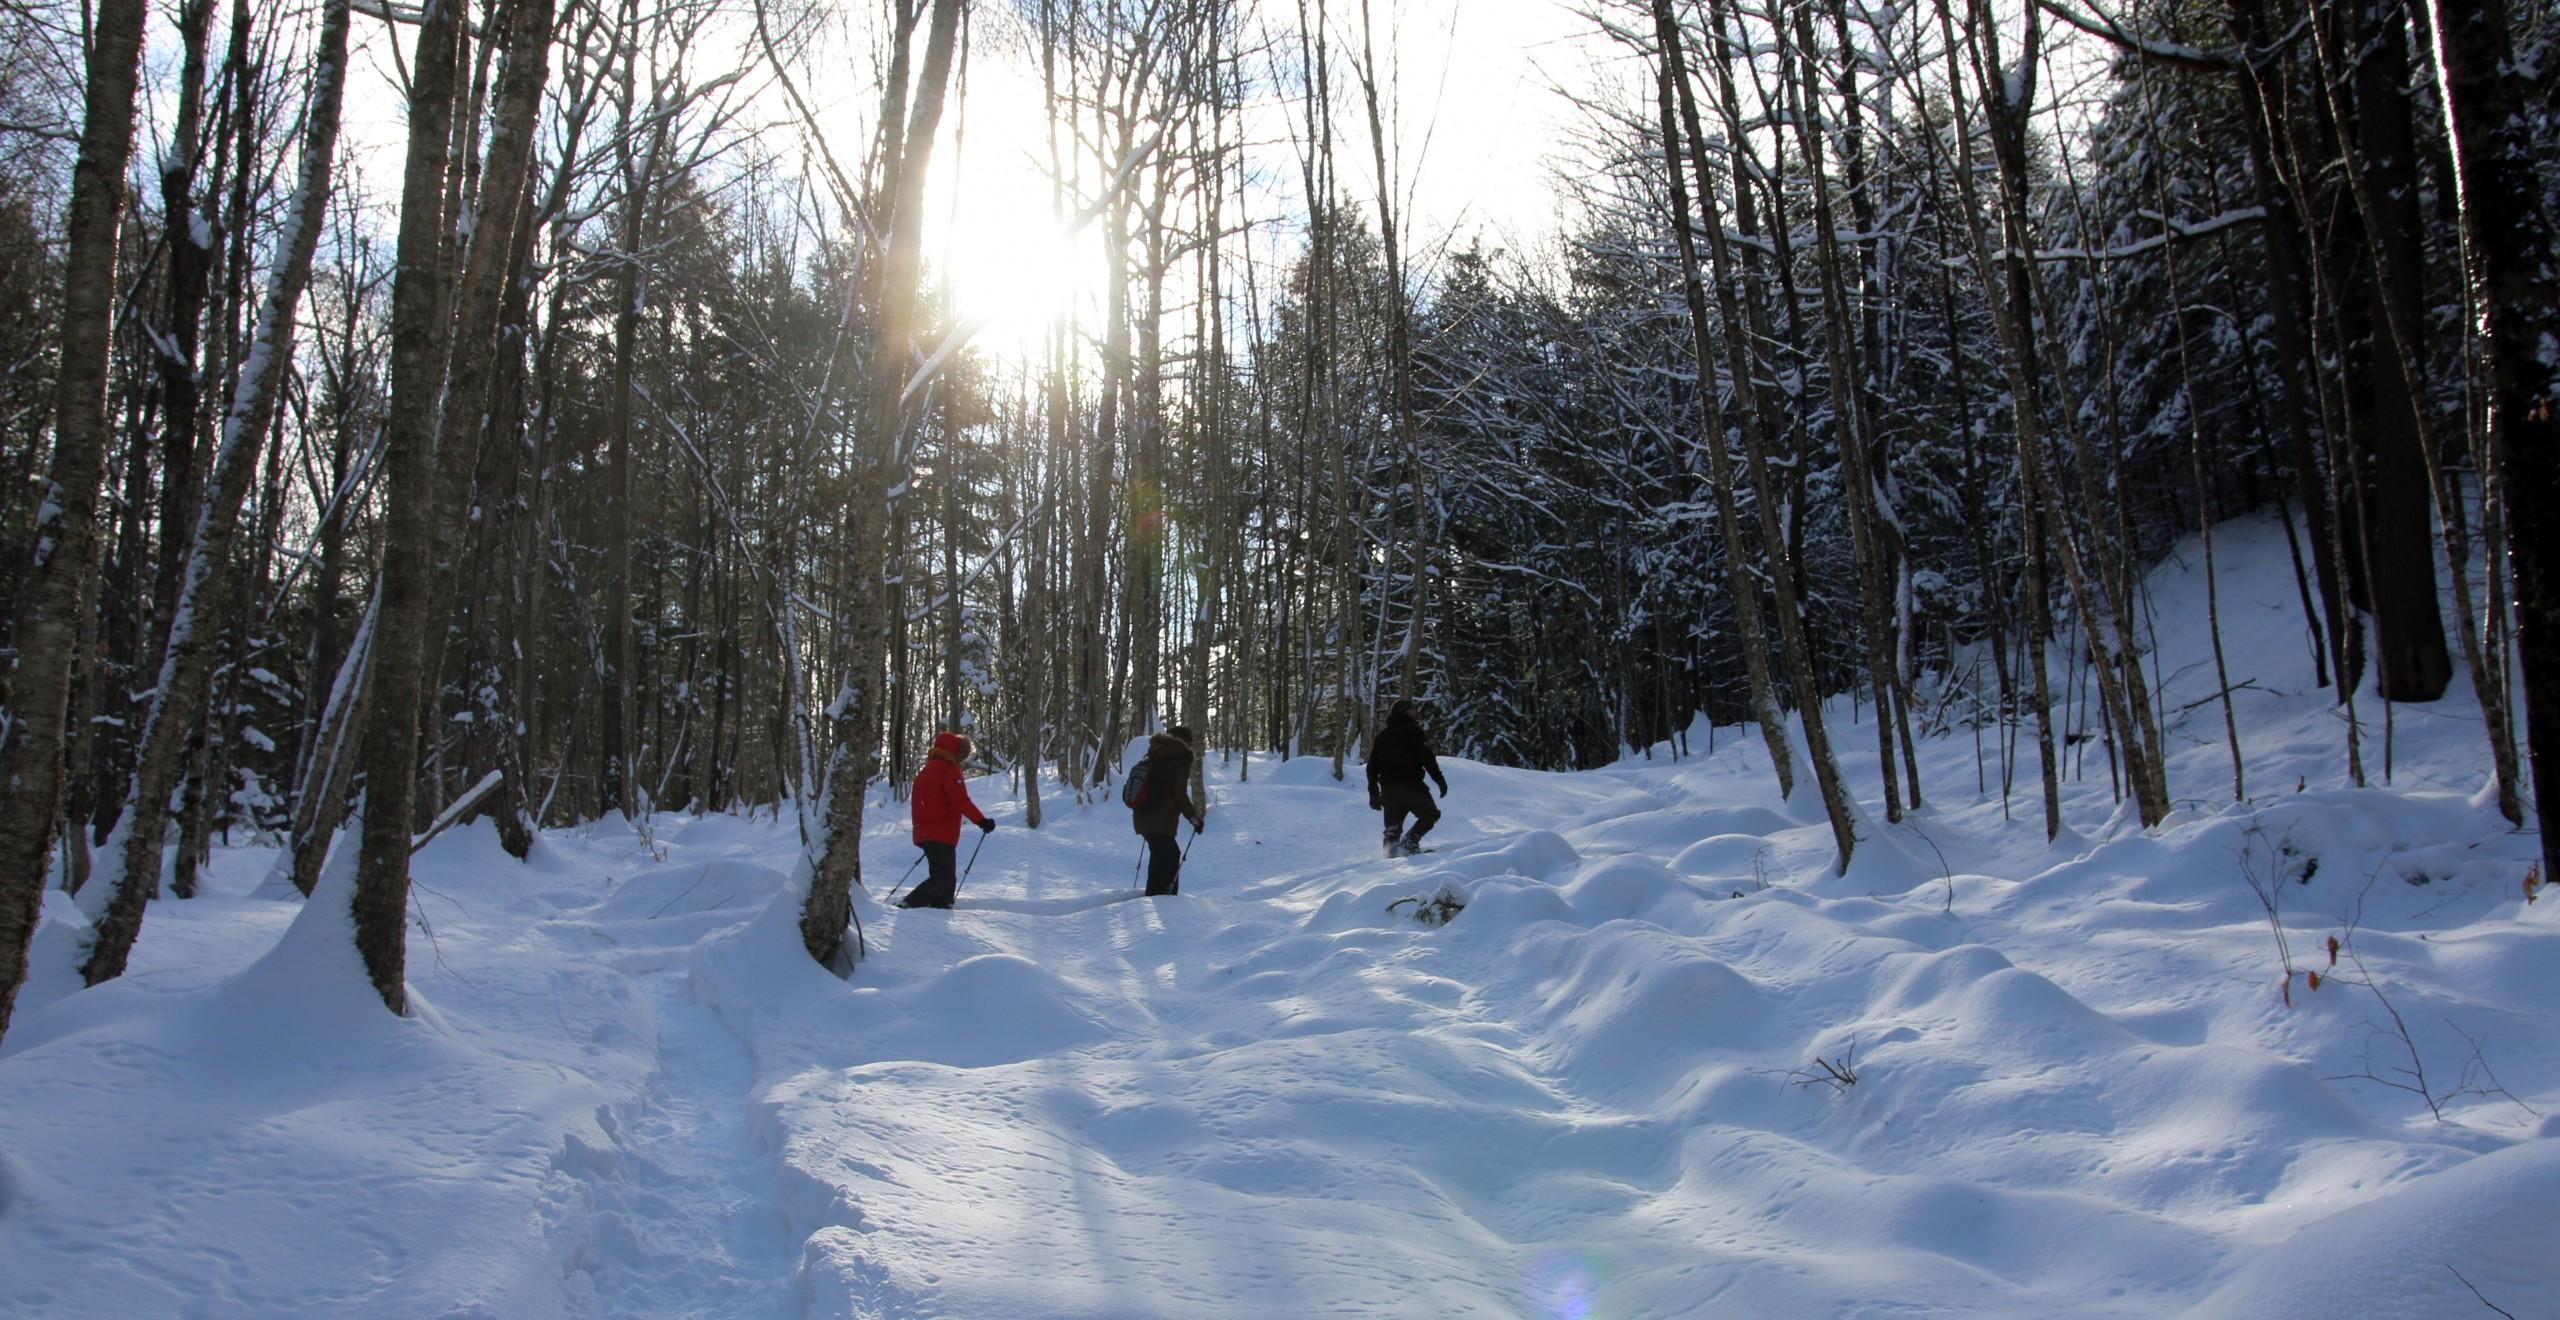 Winter Snowshoe Guided Trek